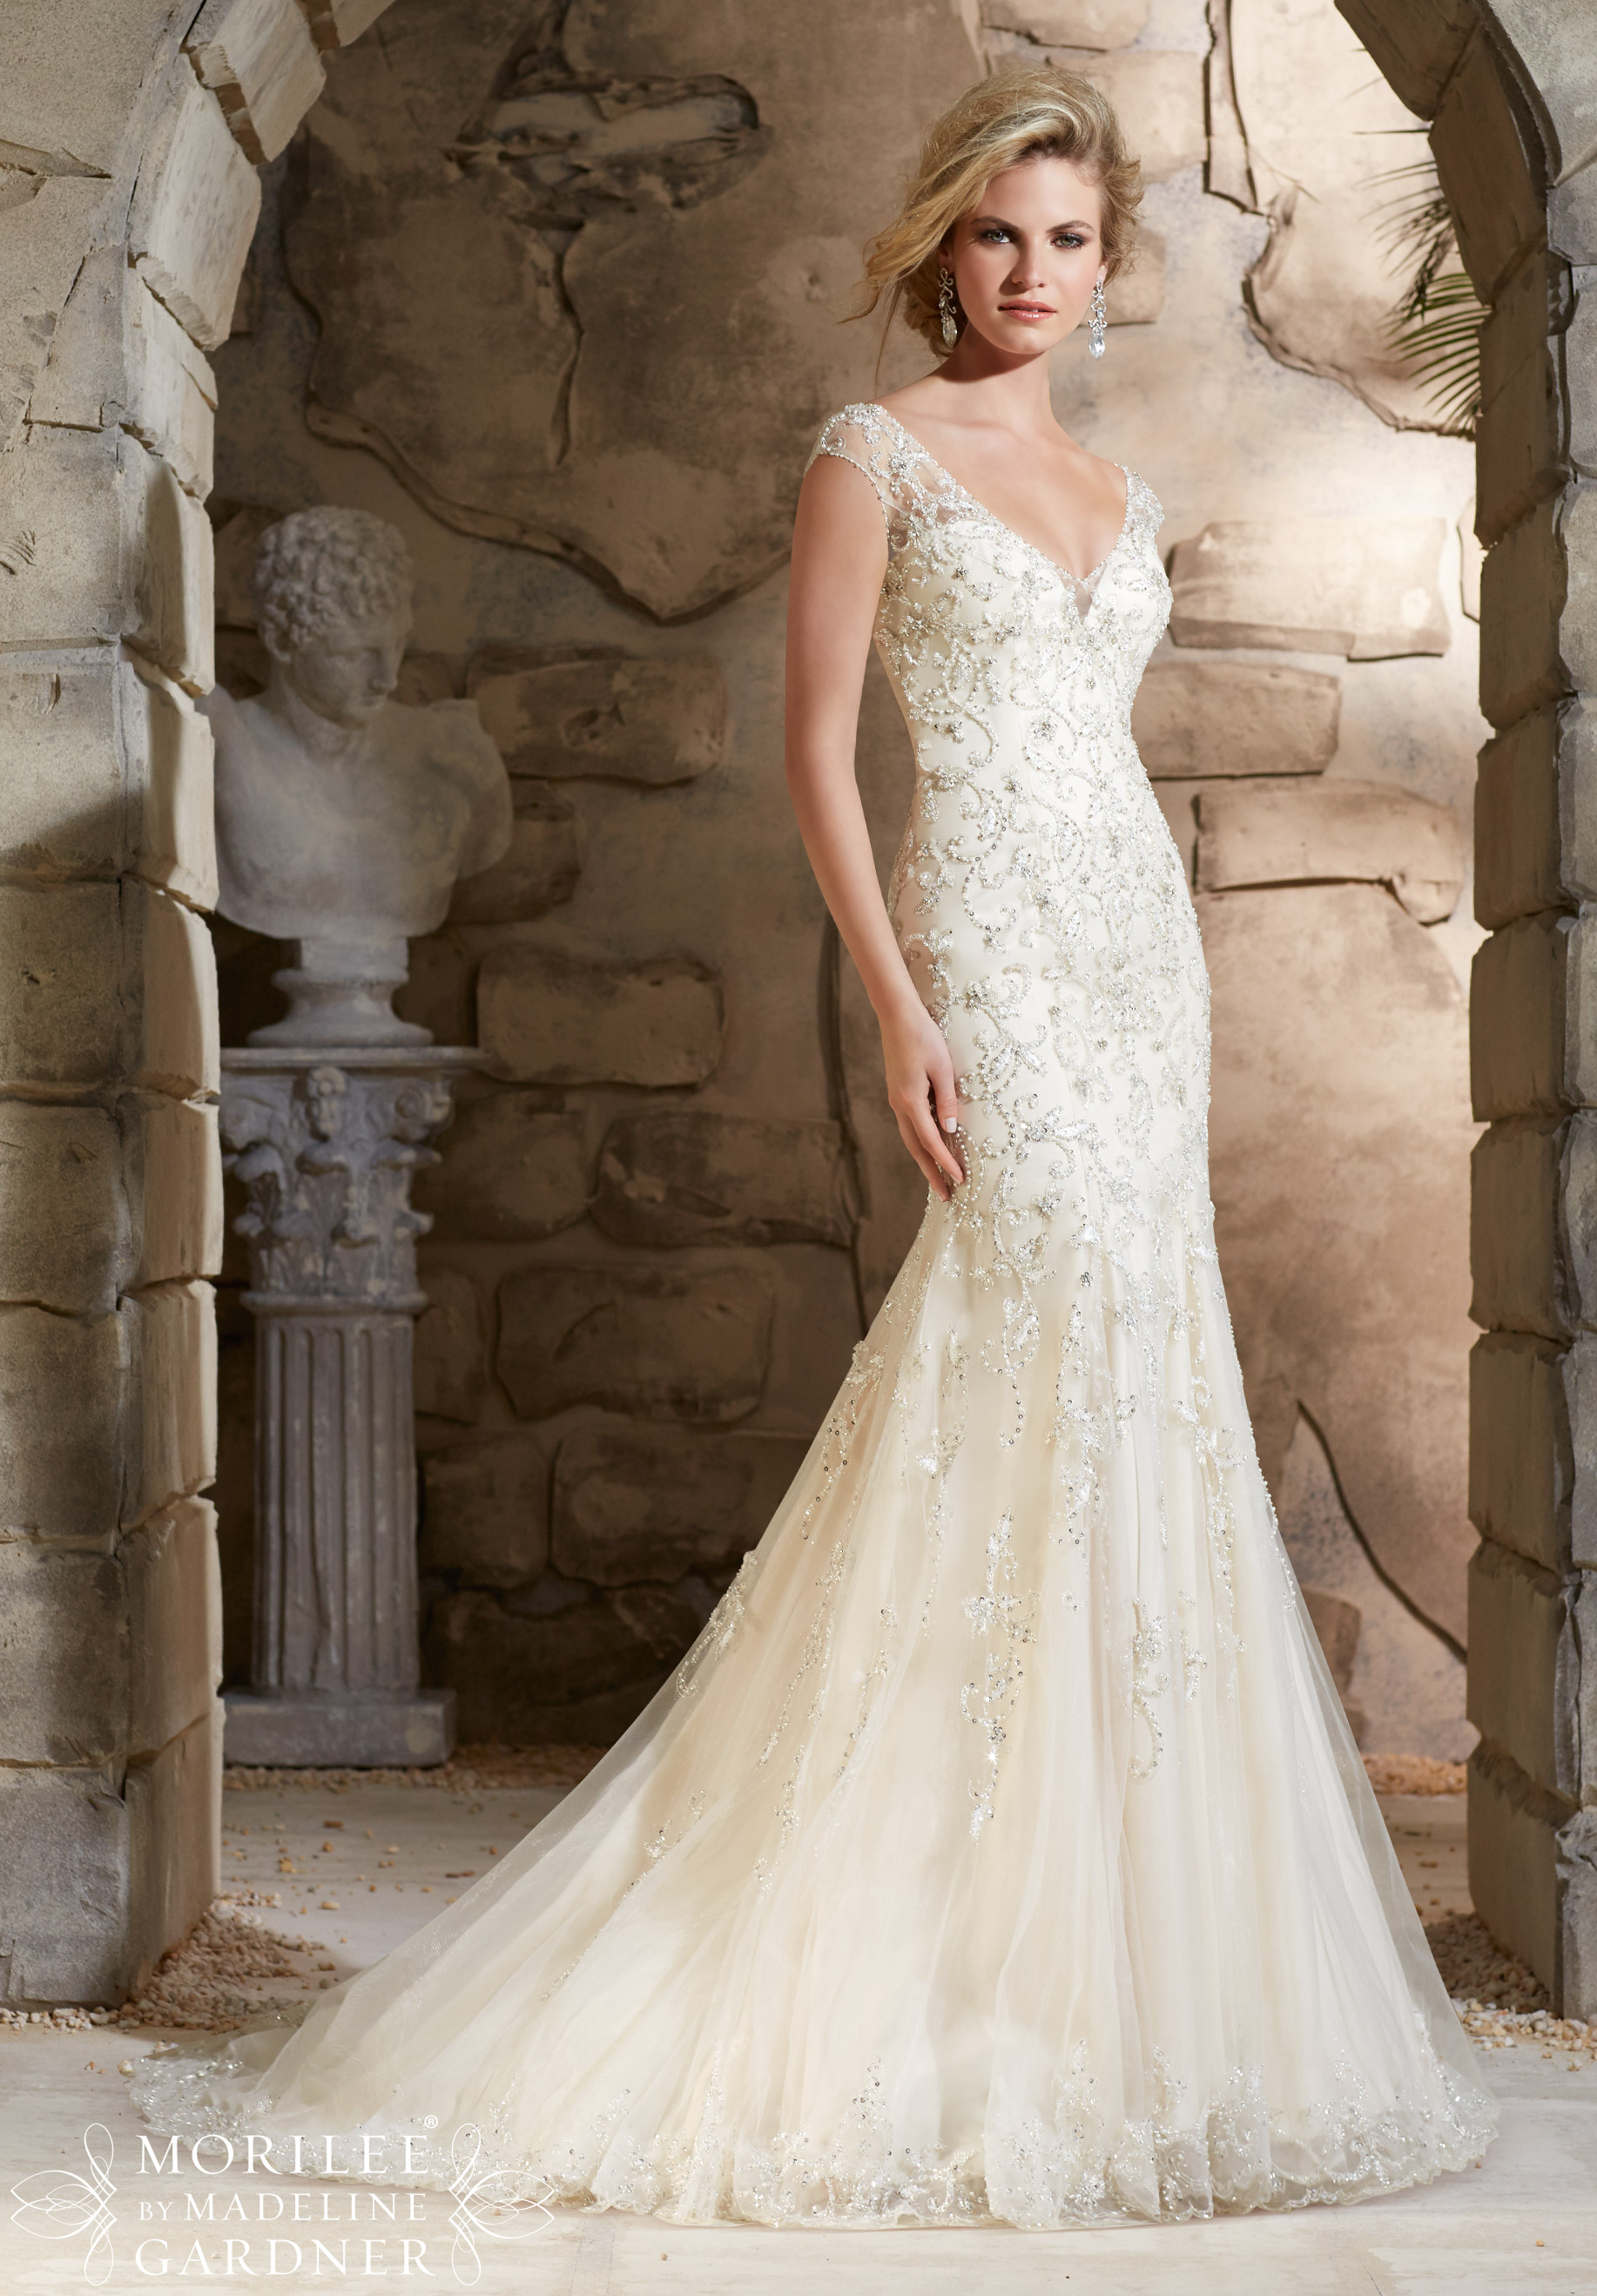 Wedding Dresses For Over 55 : Mori lee catrinas bridal